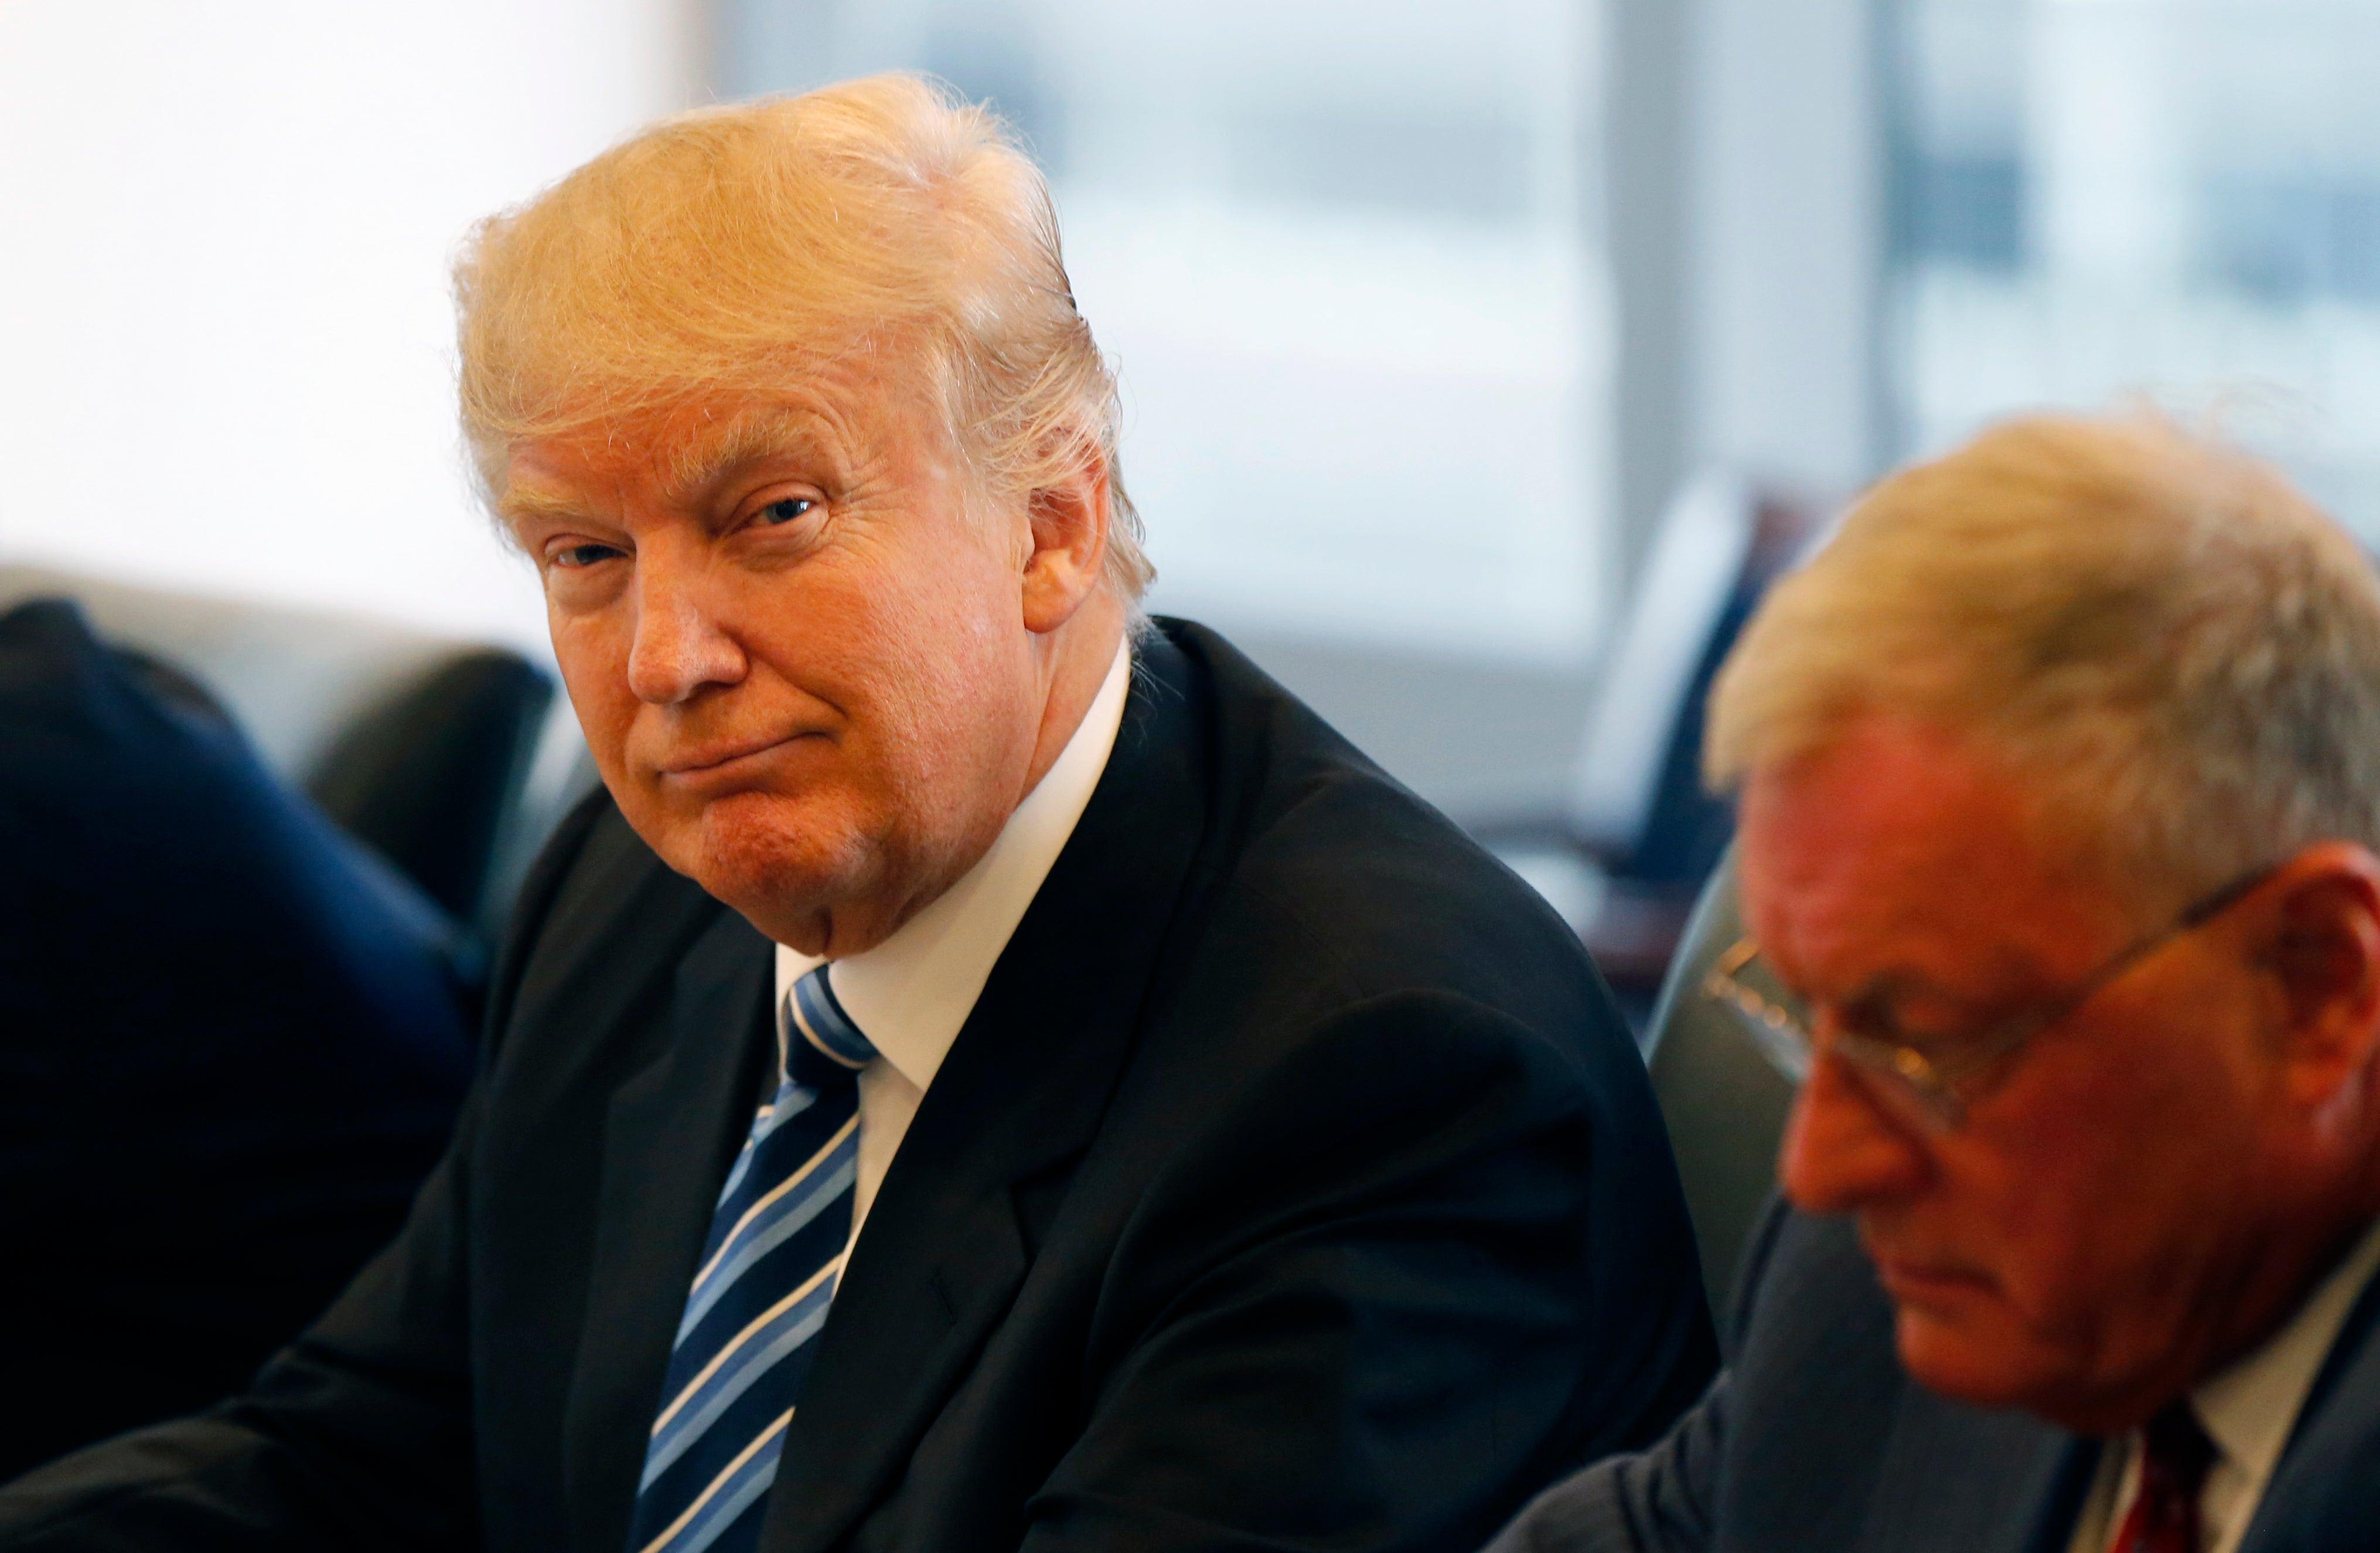 Trump's Border Wall Would Destroy Habitats Of Endangered Species